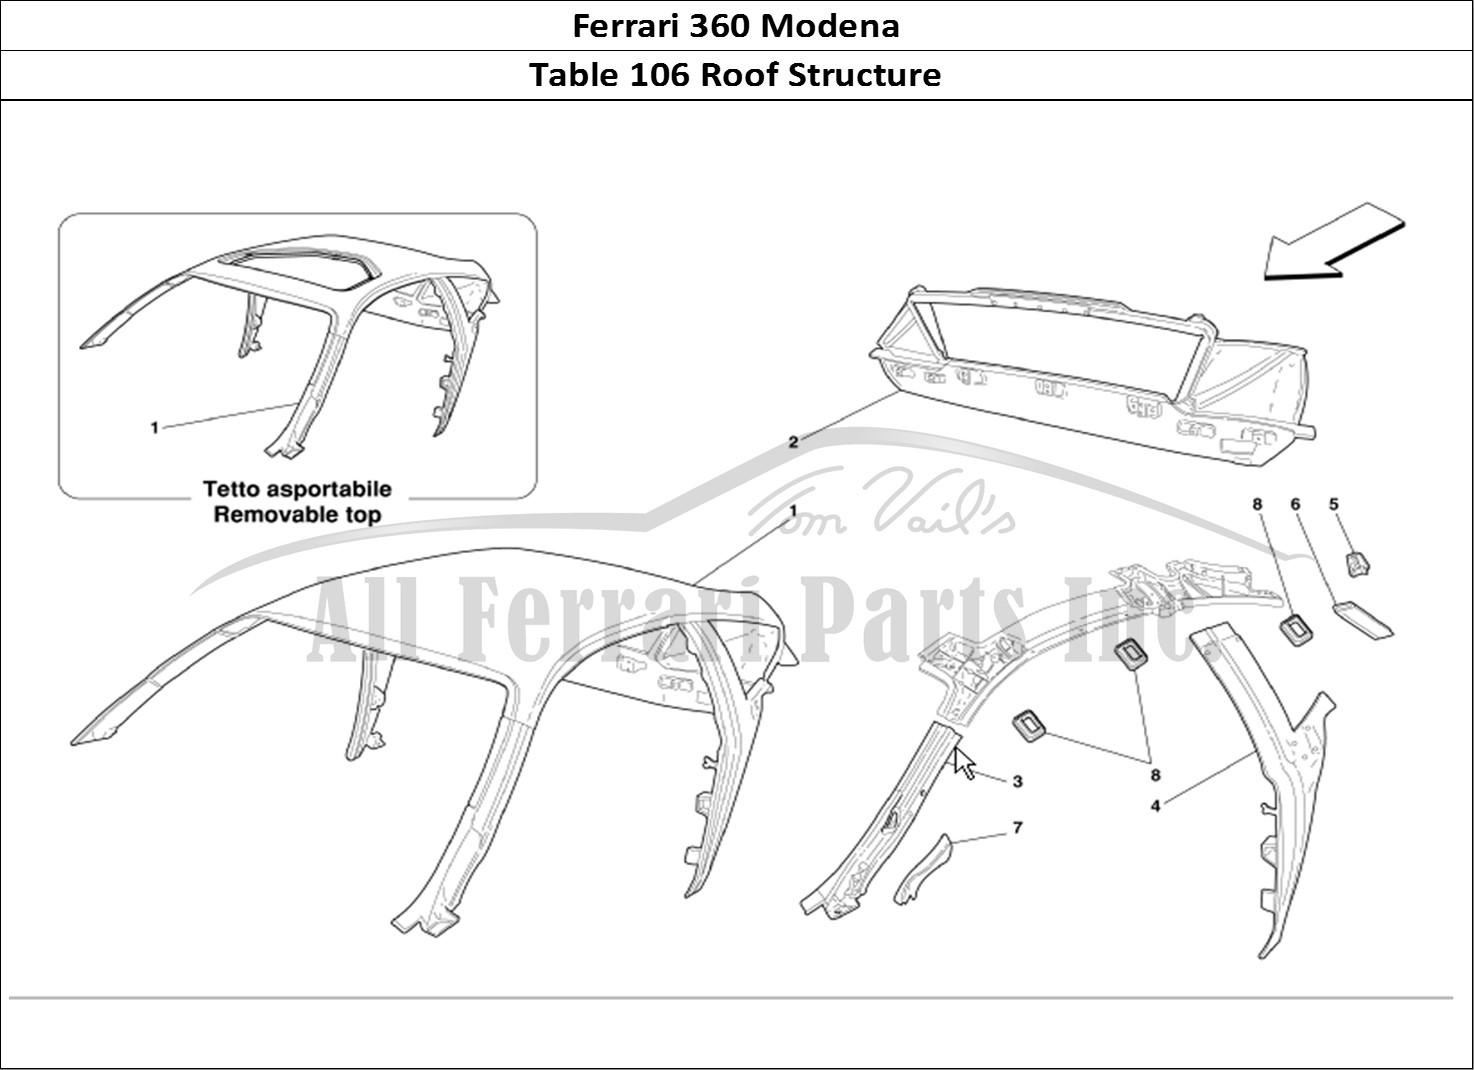 Buy Original Ferrari 360 Modena 106 Roof Structure Ferrari